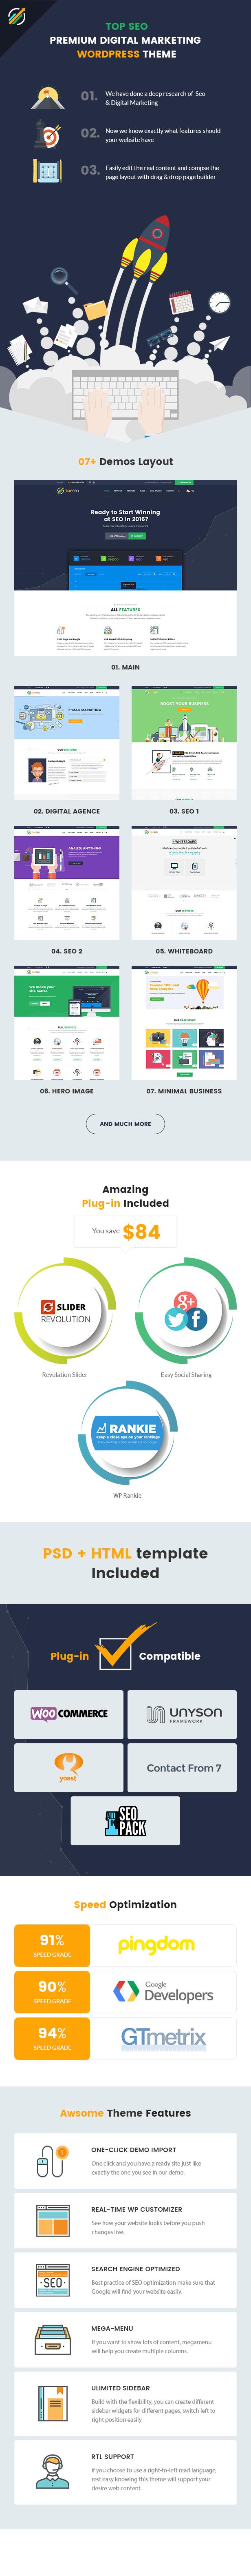 TopSEO - SEO, Digital Marketing WordPress Theme - 1